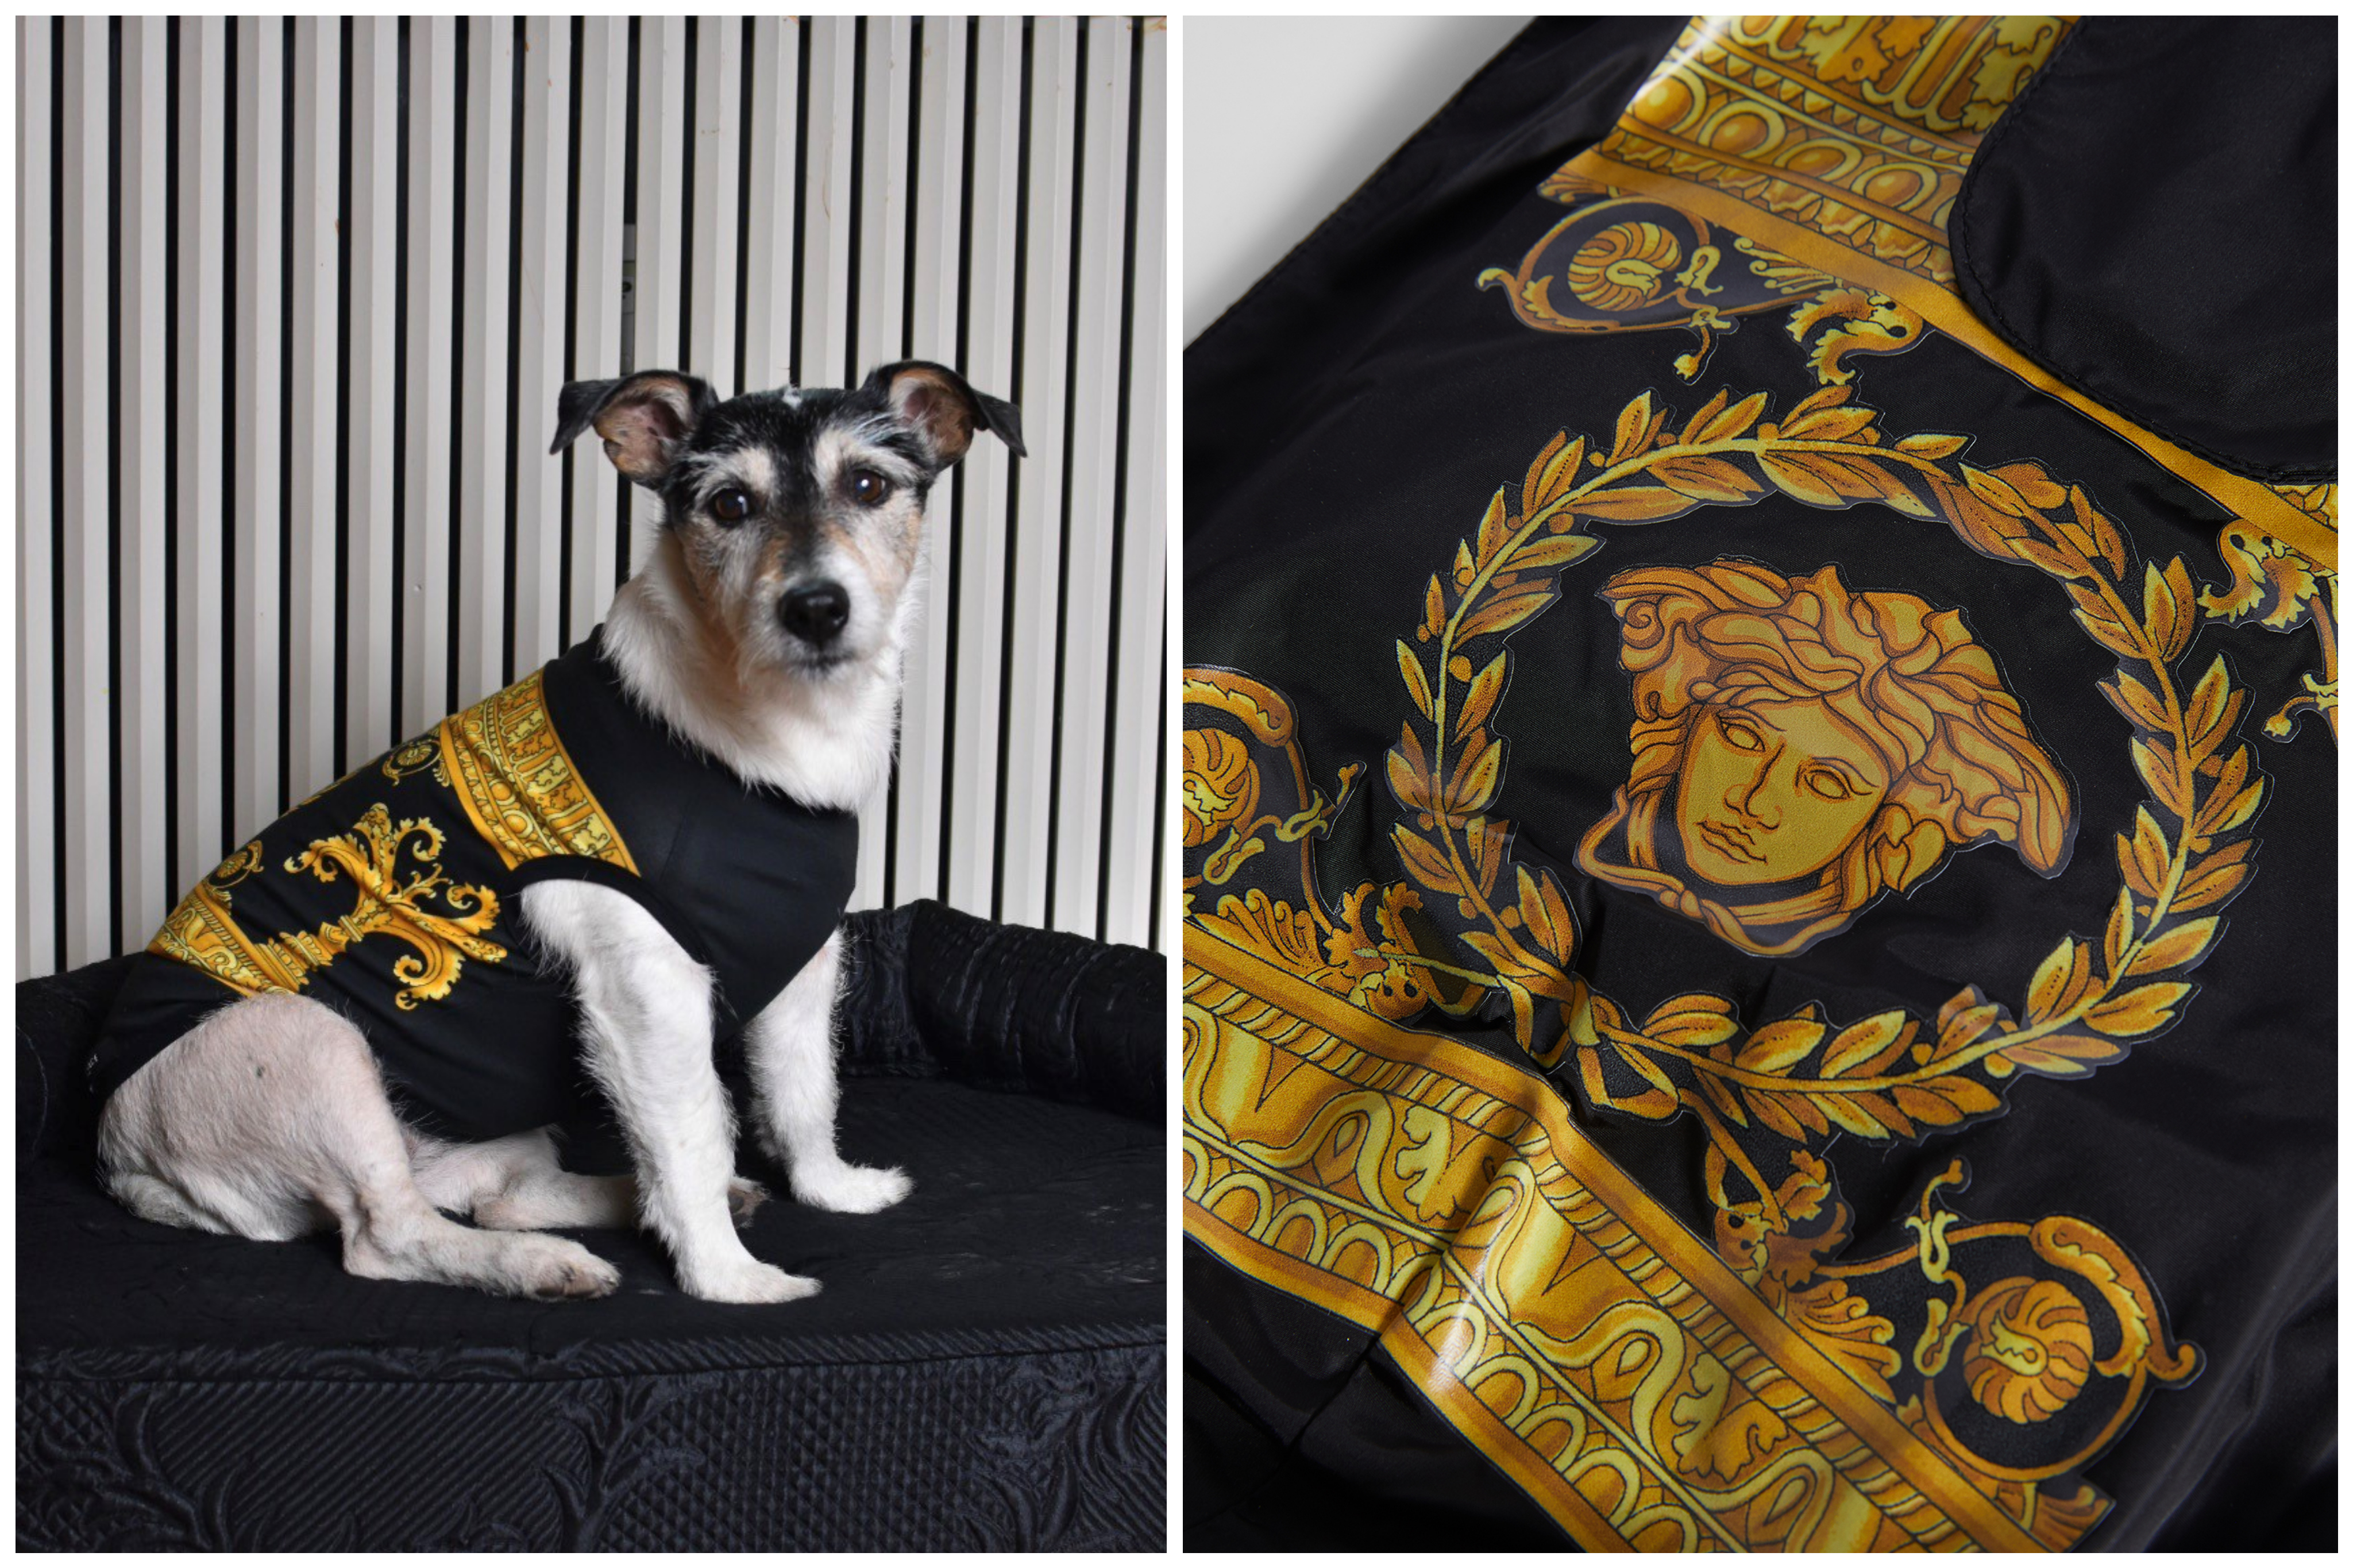 Dog Apparel